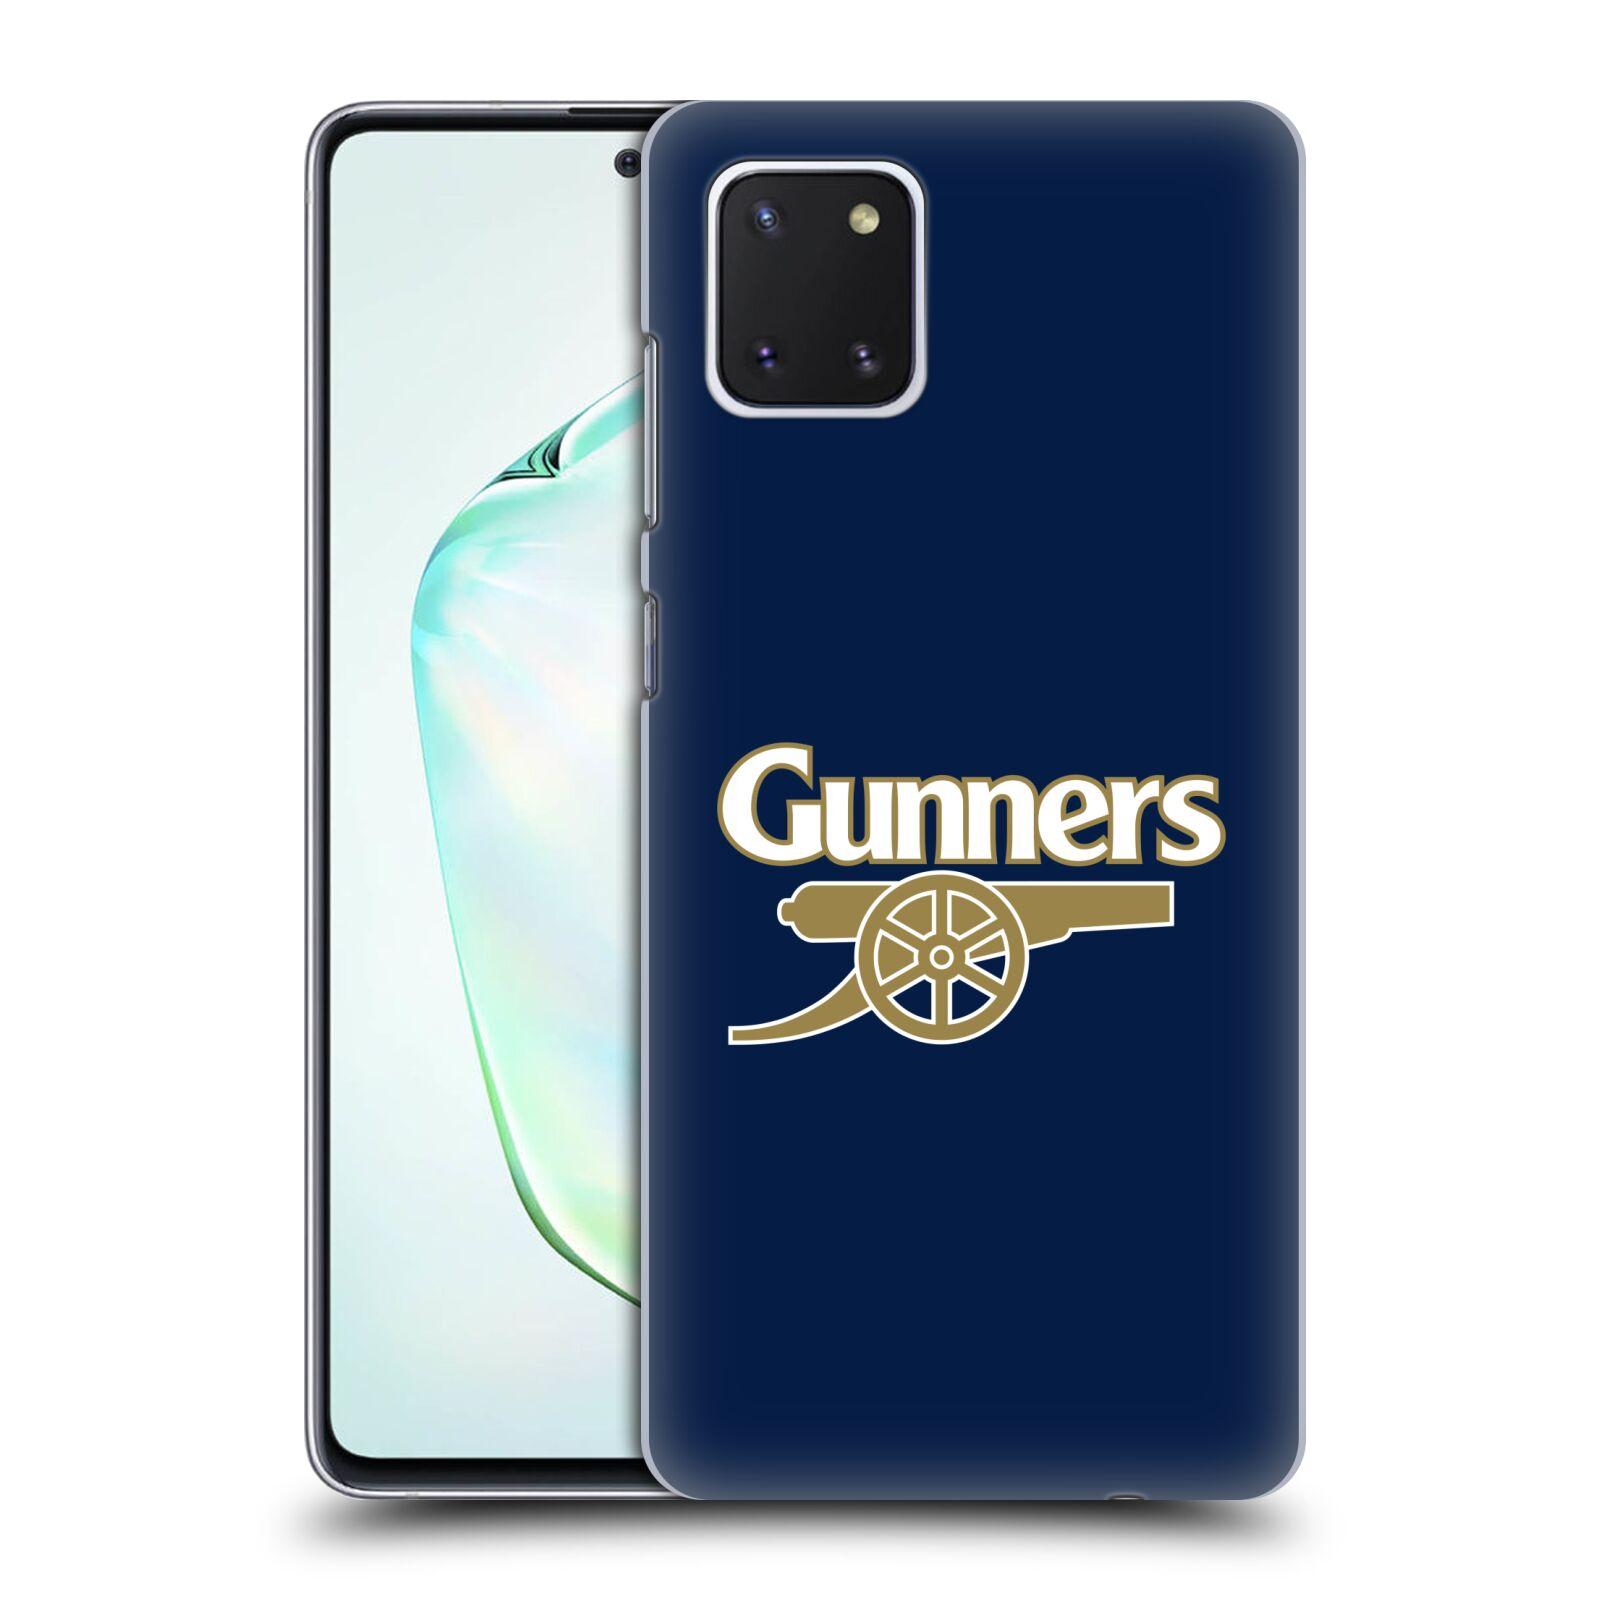 Plastové pouzdro na mobil Samsung Galaxy Note 10 Lite - Head Case - Arsenal FC - Gunners